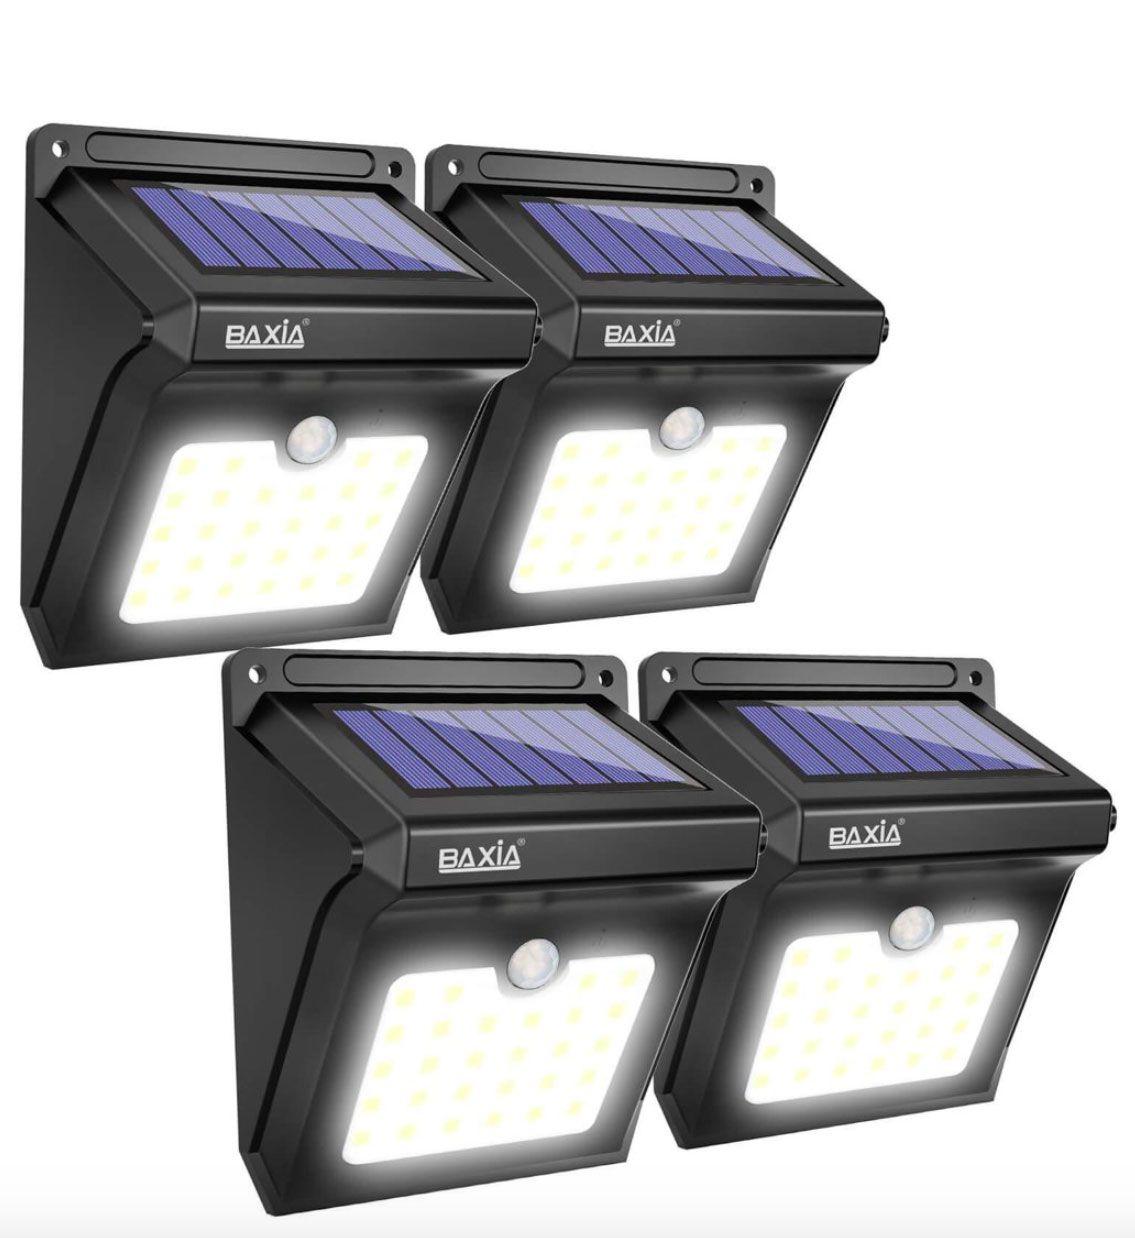 Baxia Motion Sensor Solar Lights